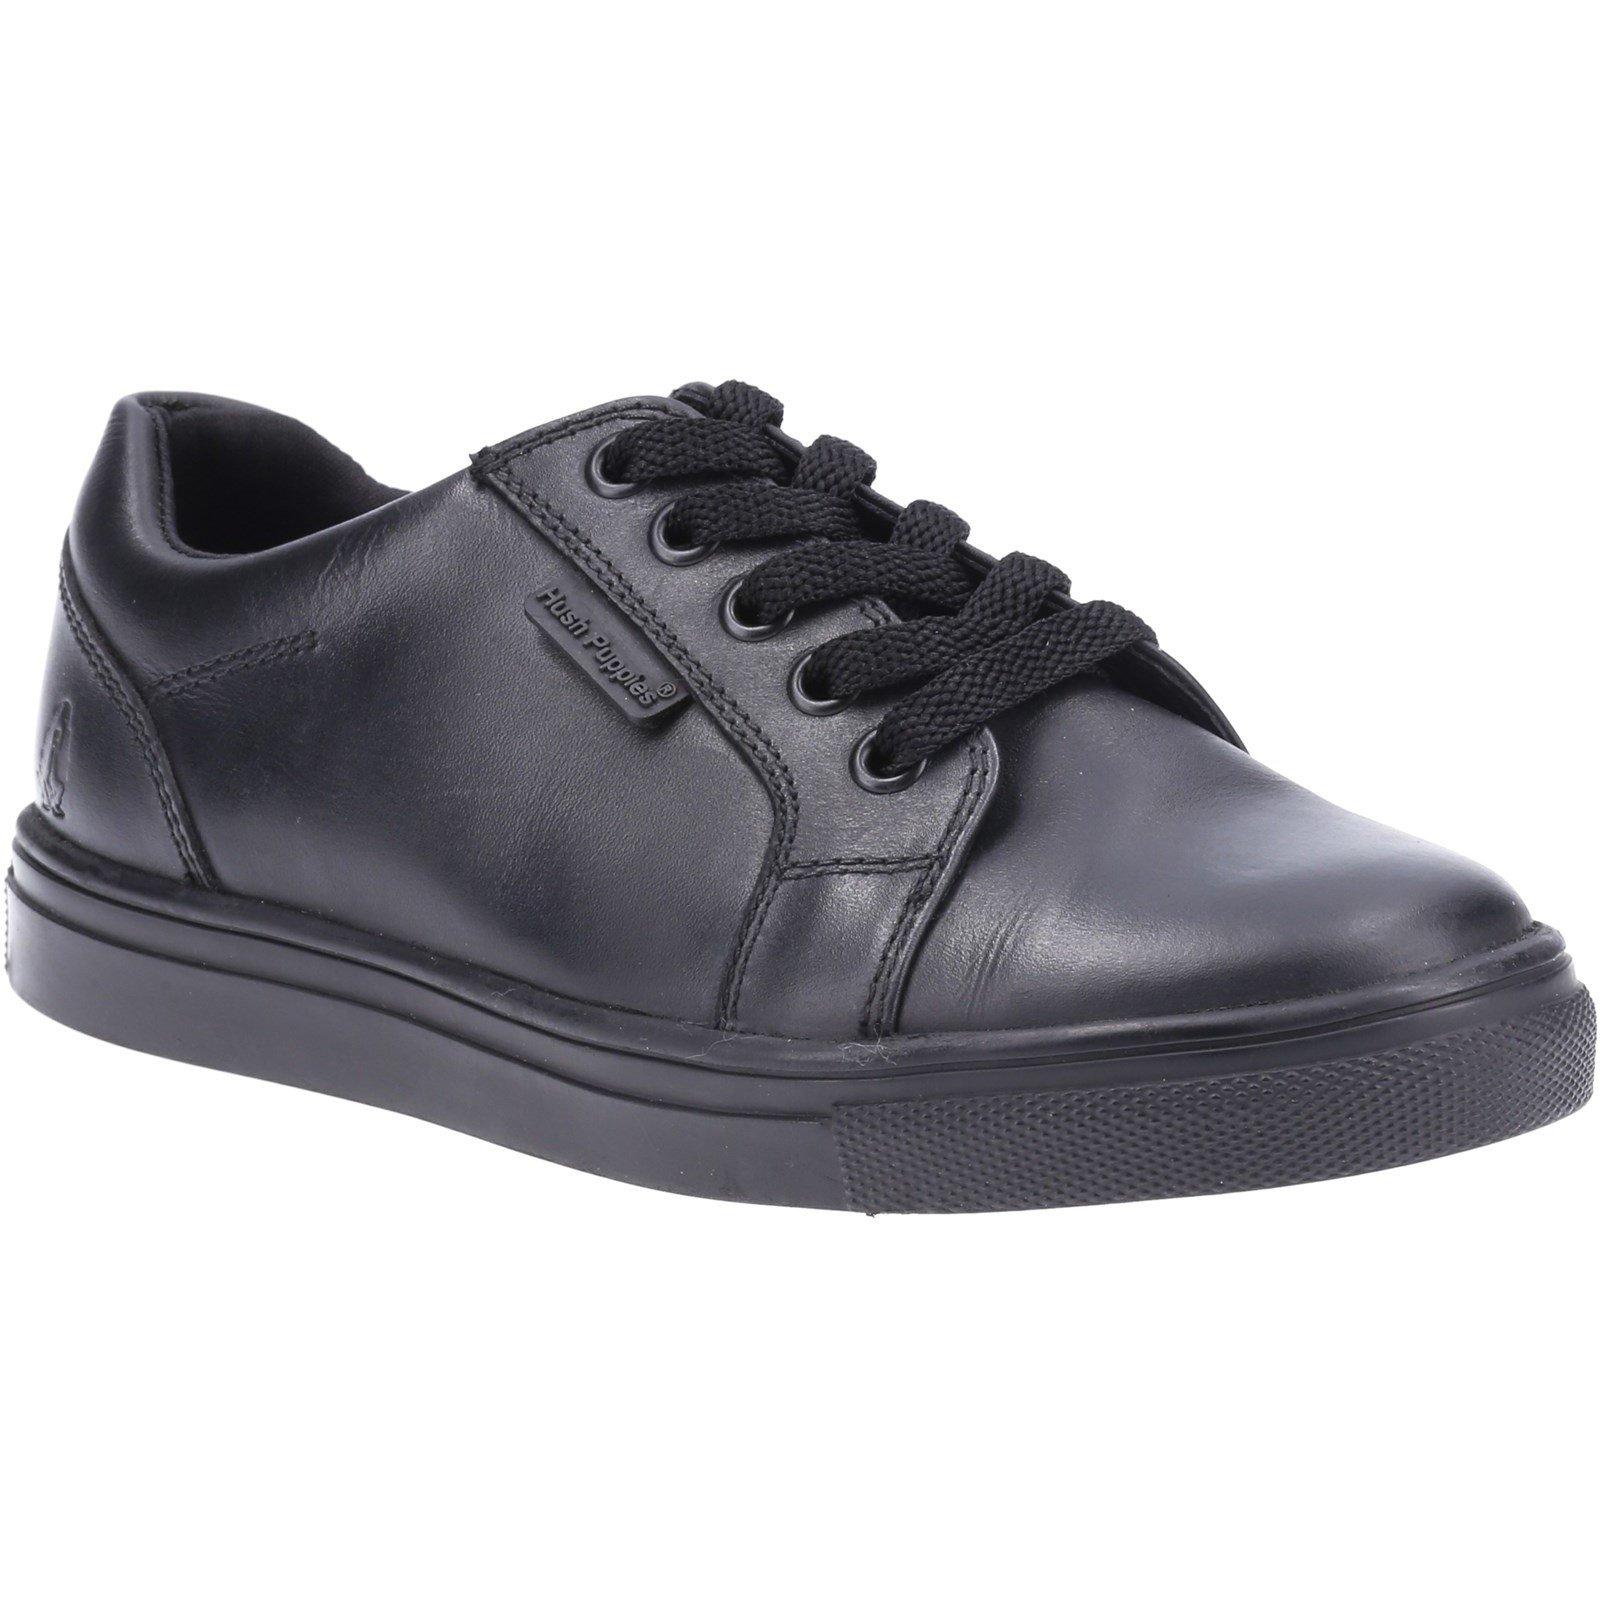 Hush Puppies Kid's Sam Junior School Shoe Black 32579 - Black 11